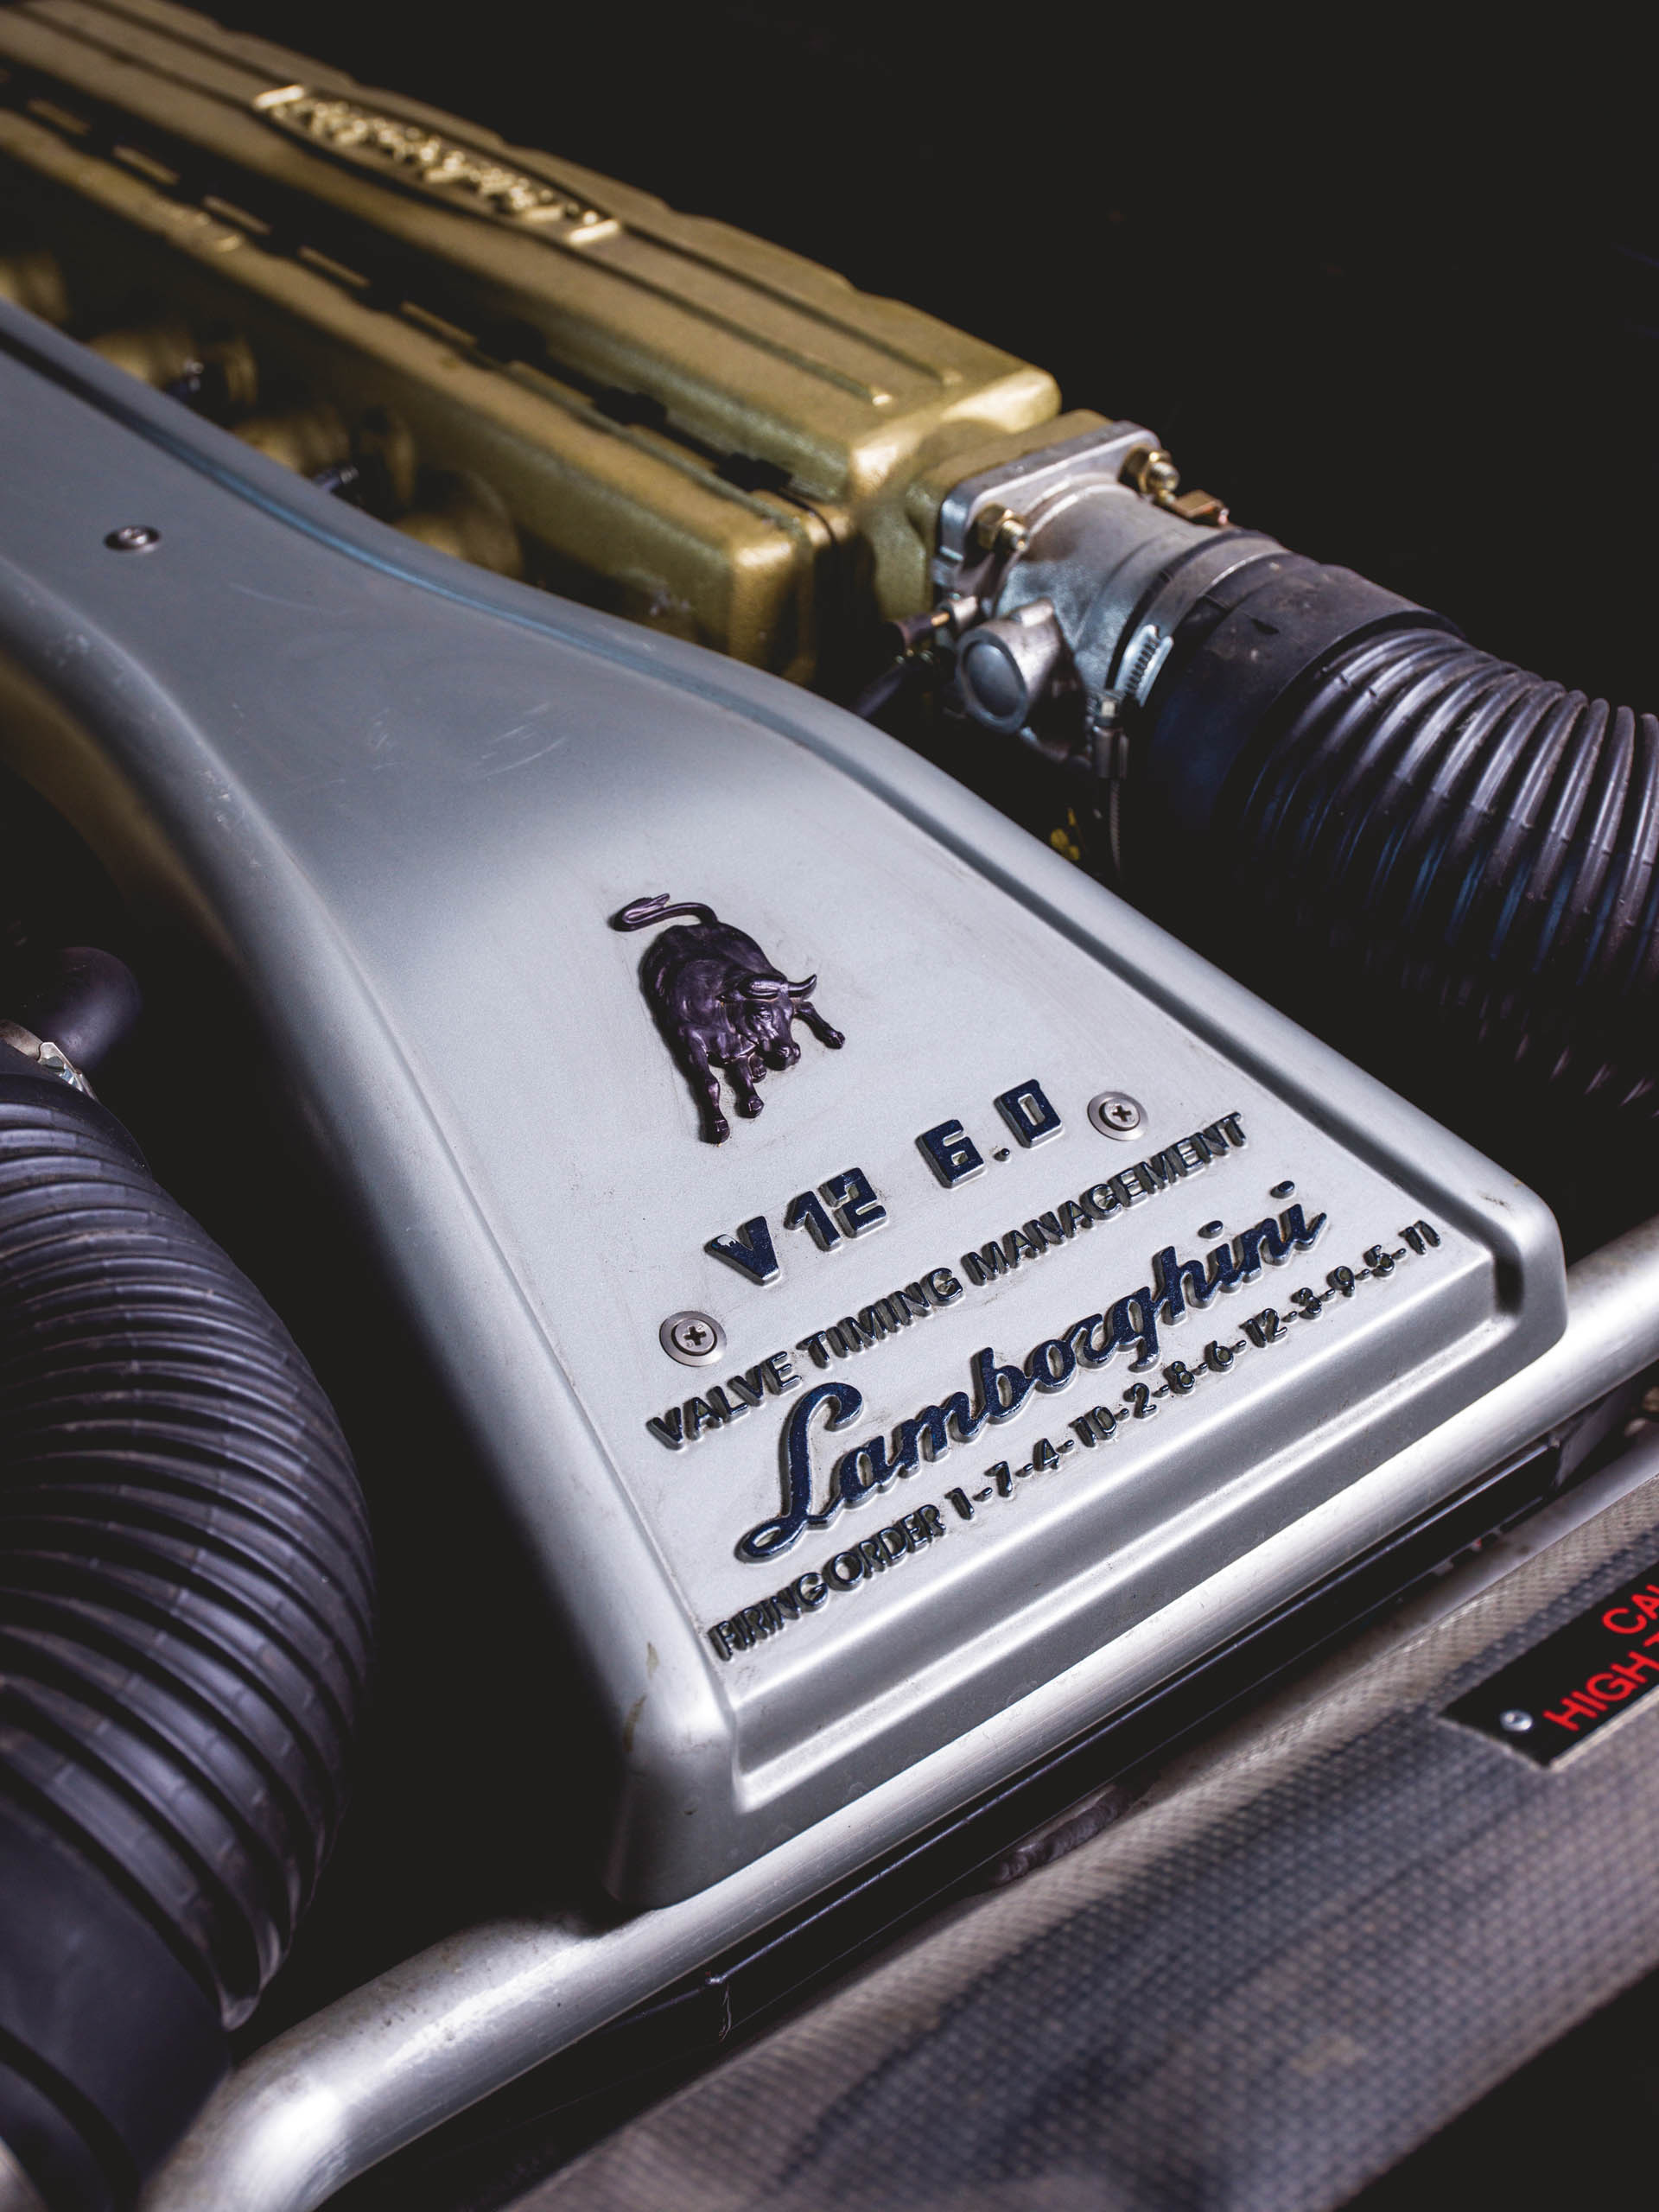 Lamborghini Diablo VT 6.0 SE for sale (20)